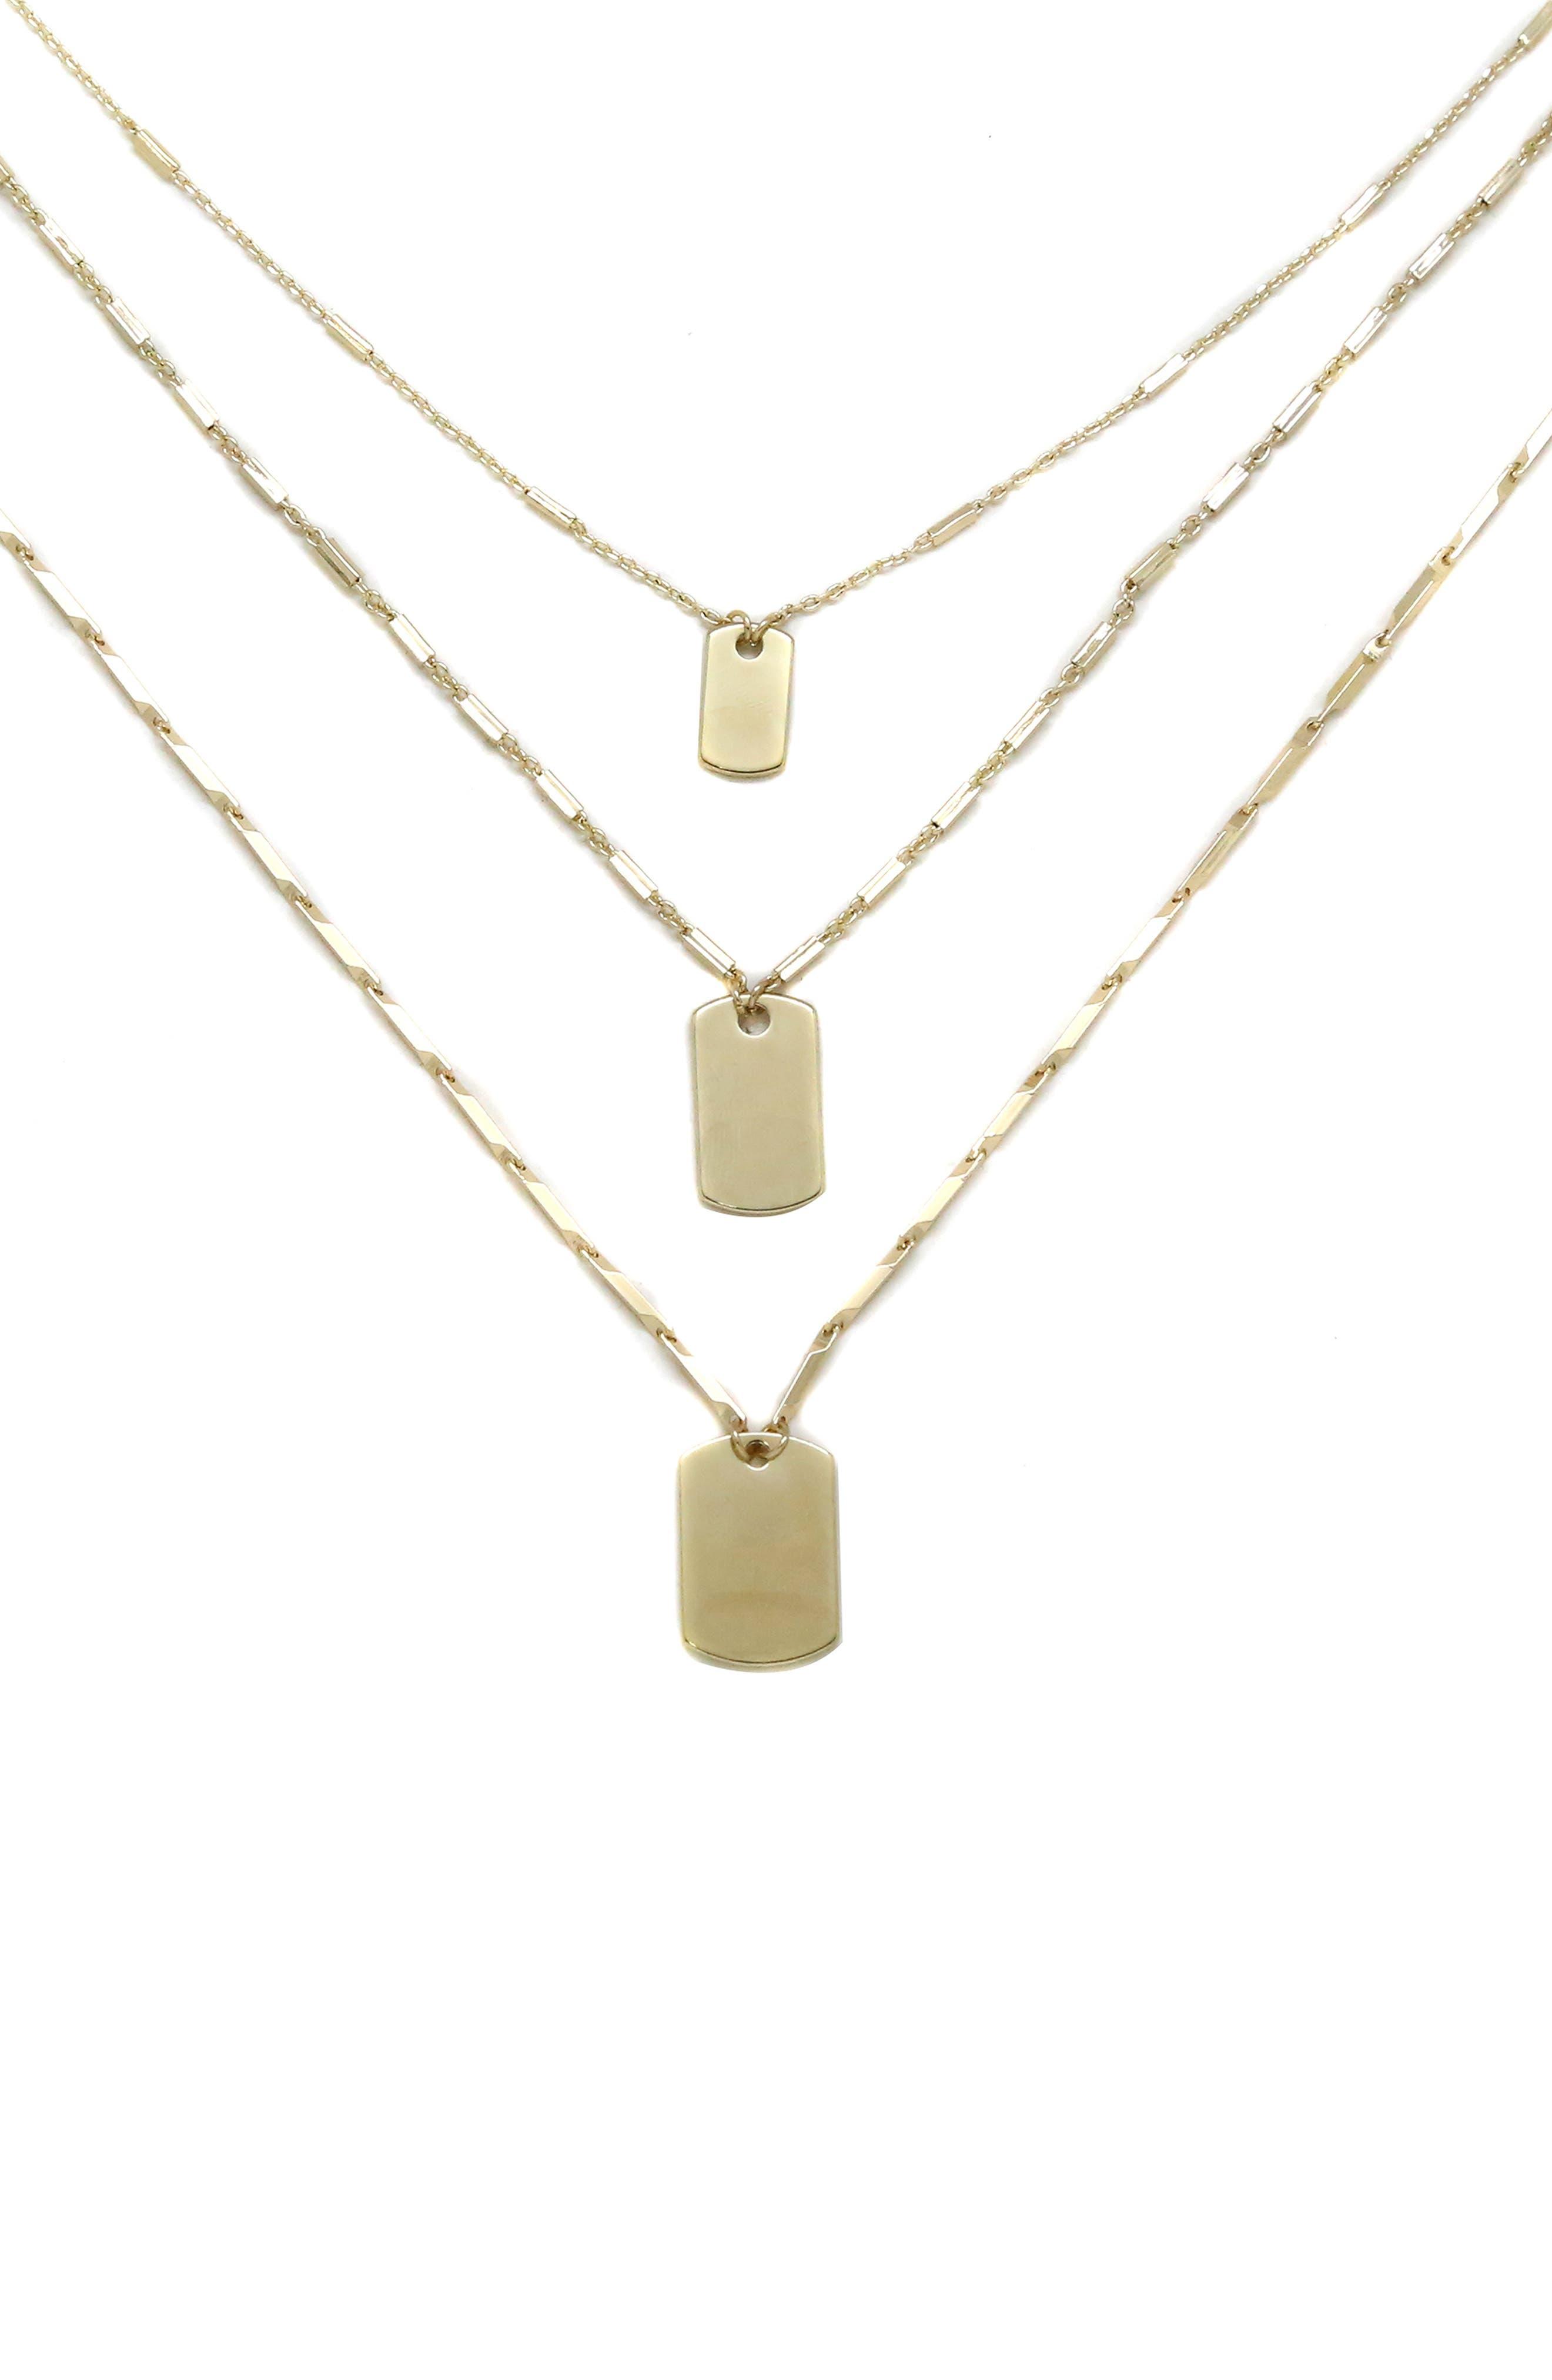 ETTIKA Set Of 3 Tag Pendant Necklaces in Gold